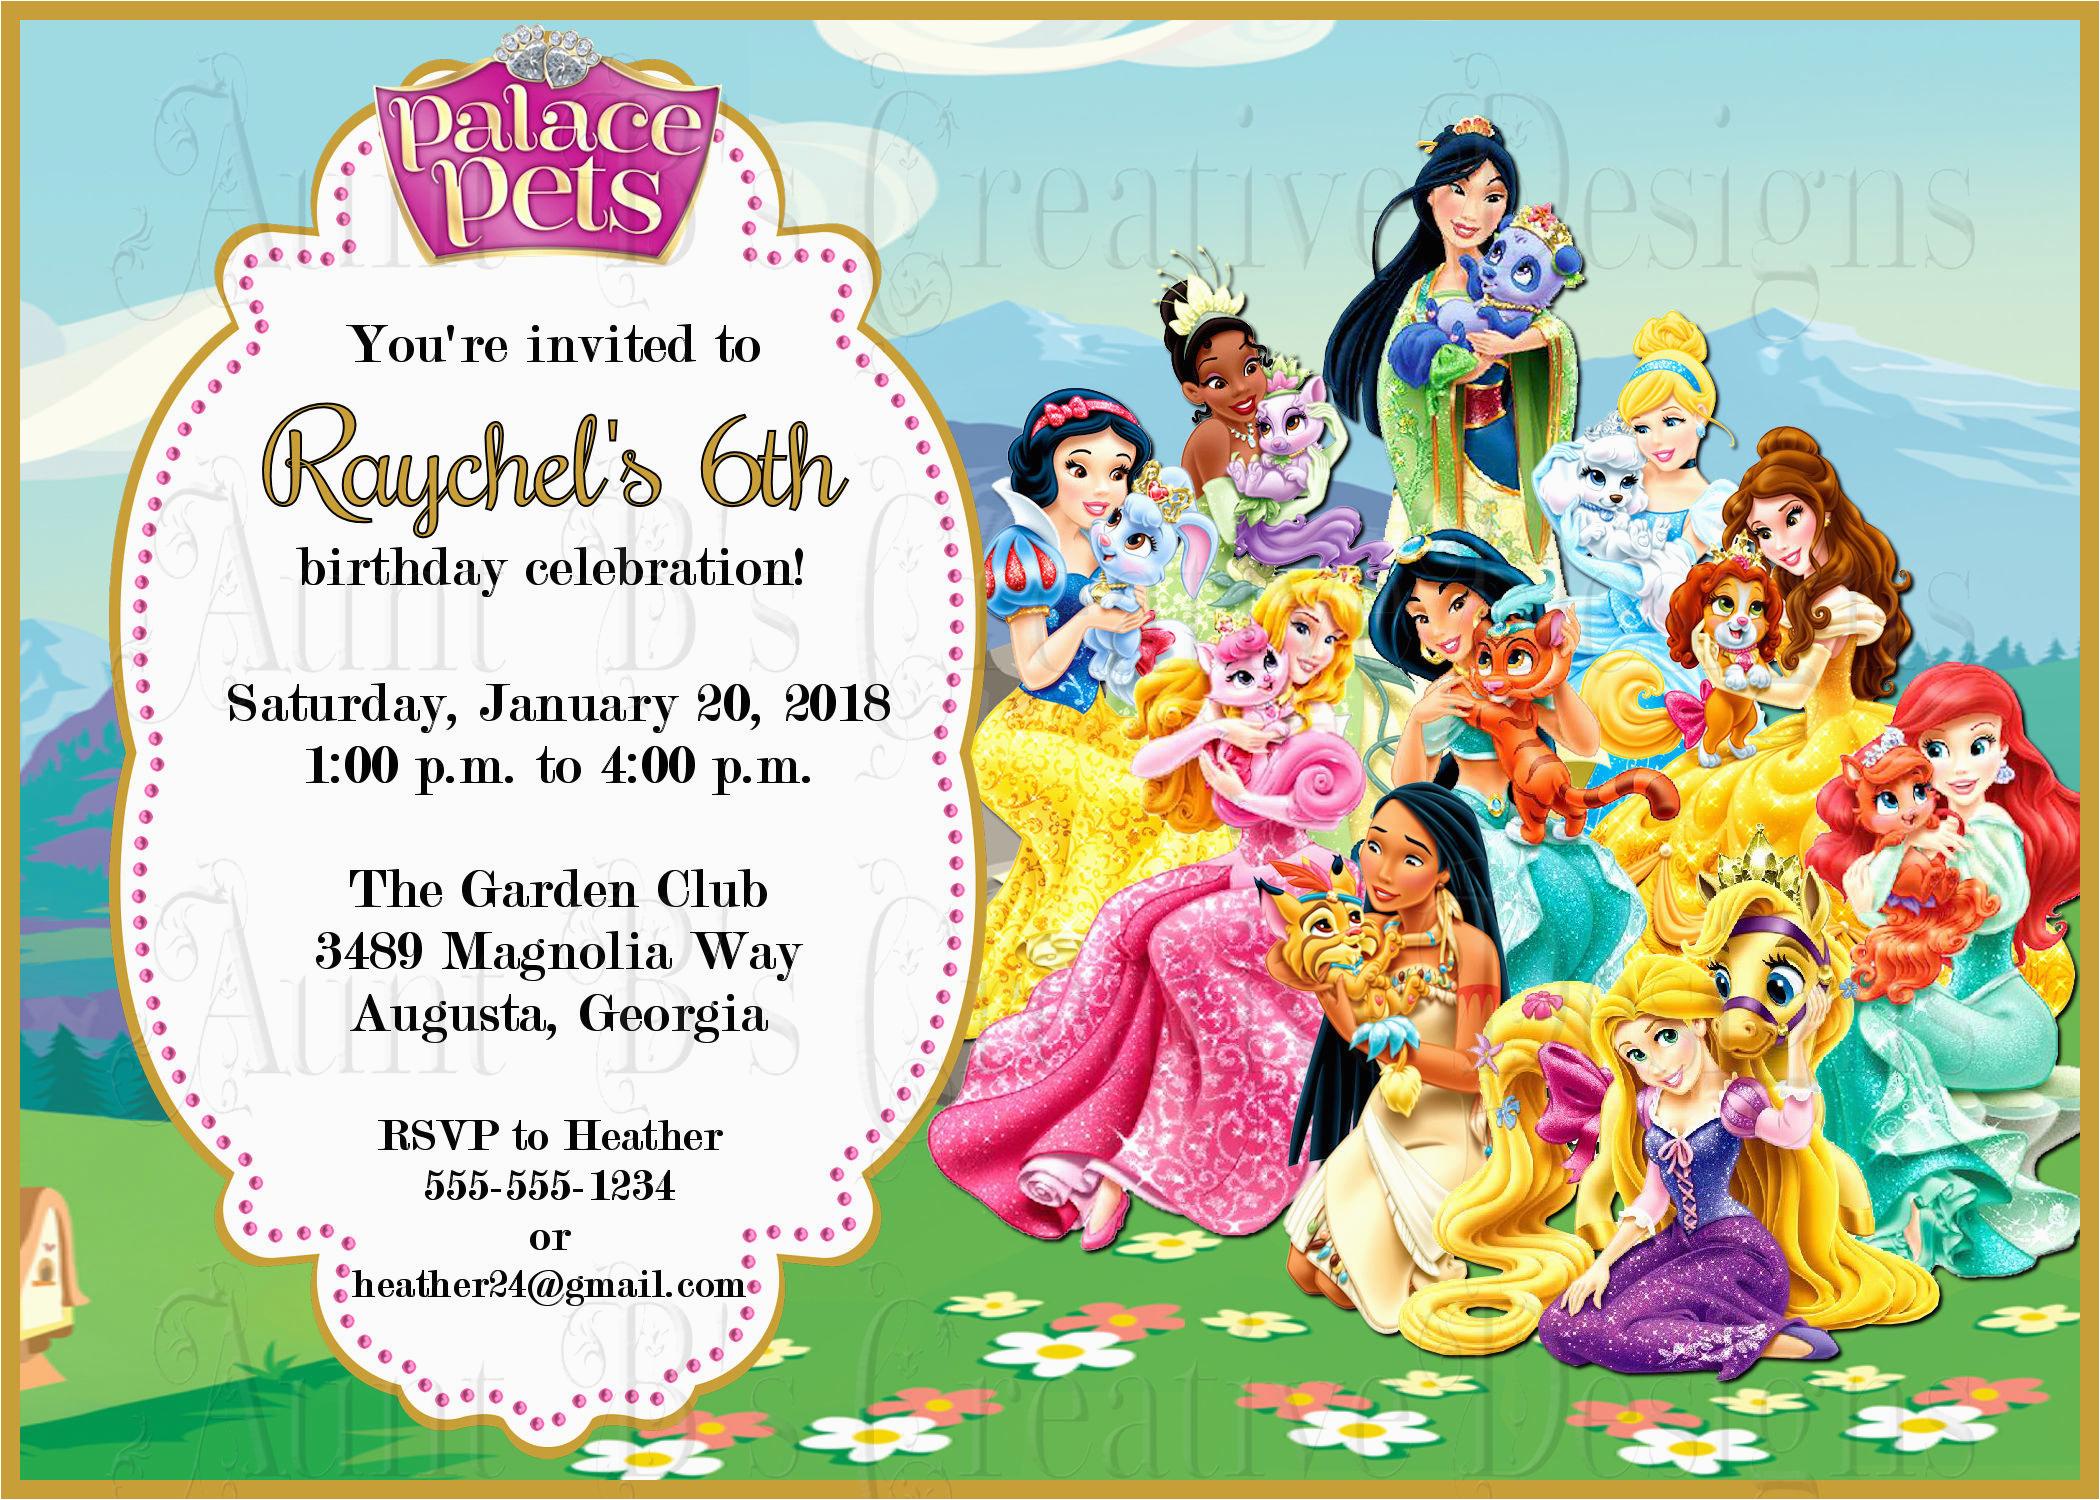 Disney Character Birthday Invitations Disney Invitation Templates Free Yourweek 455be6eca25e